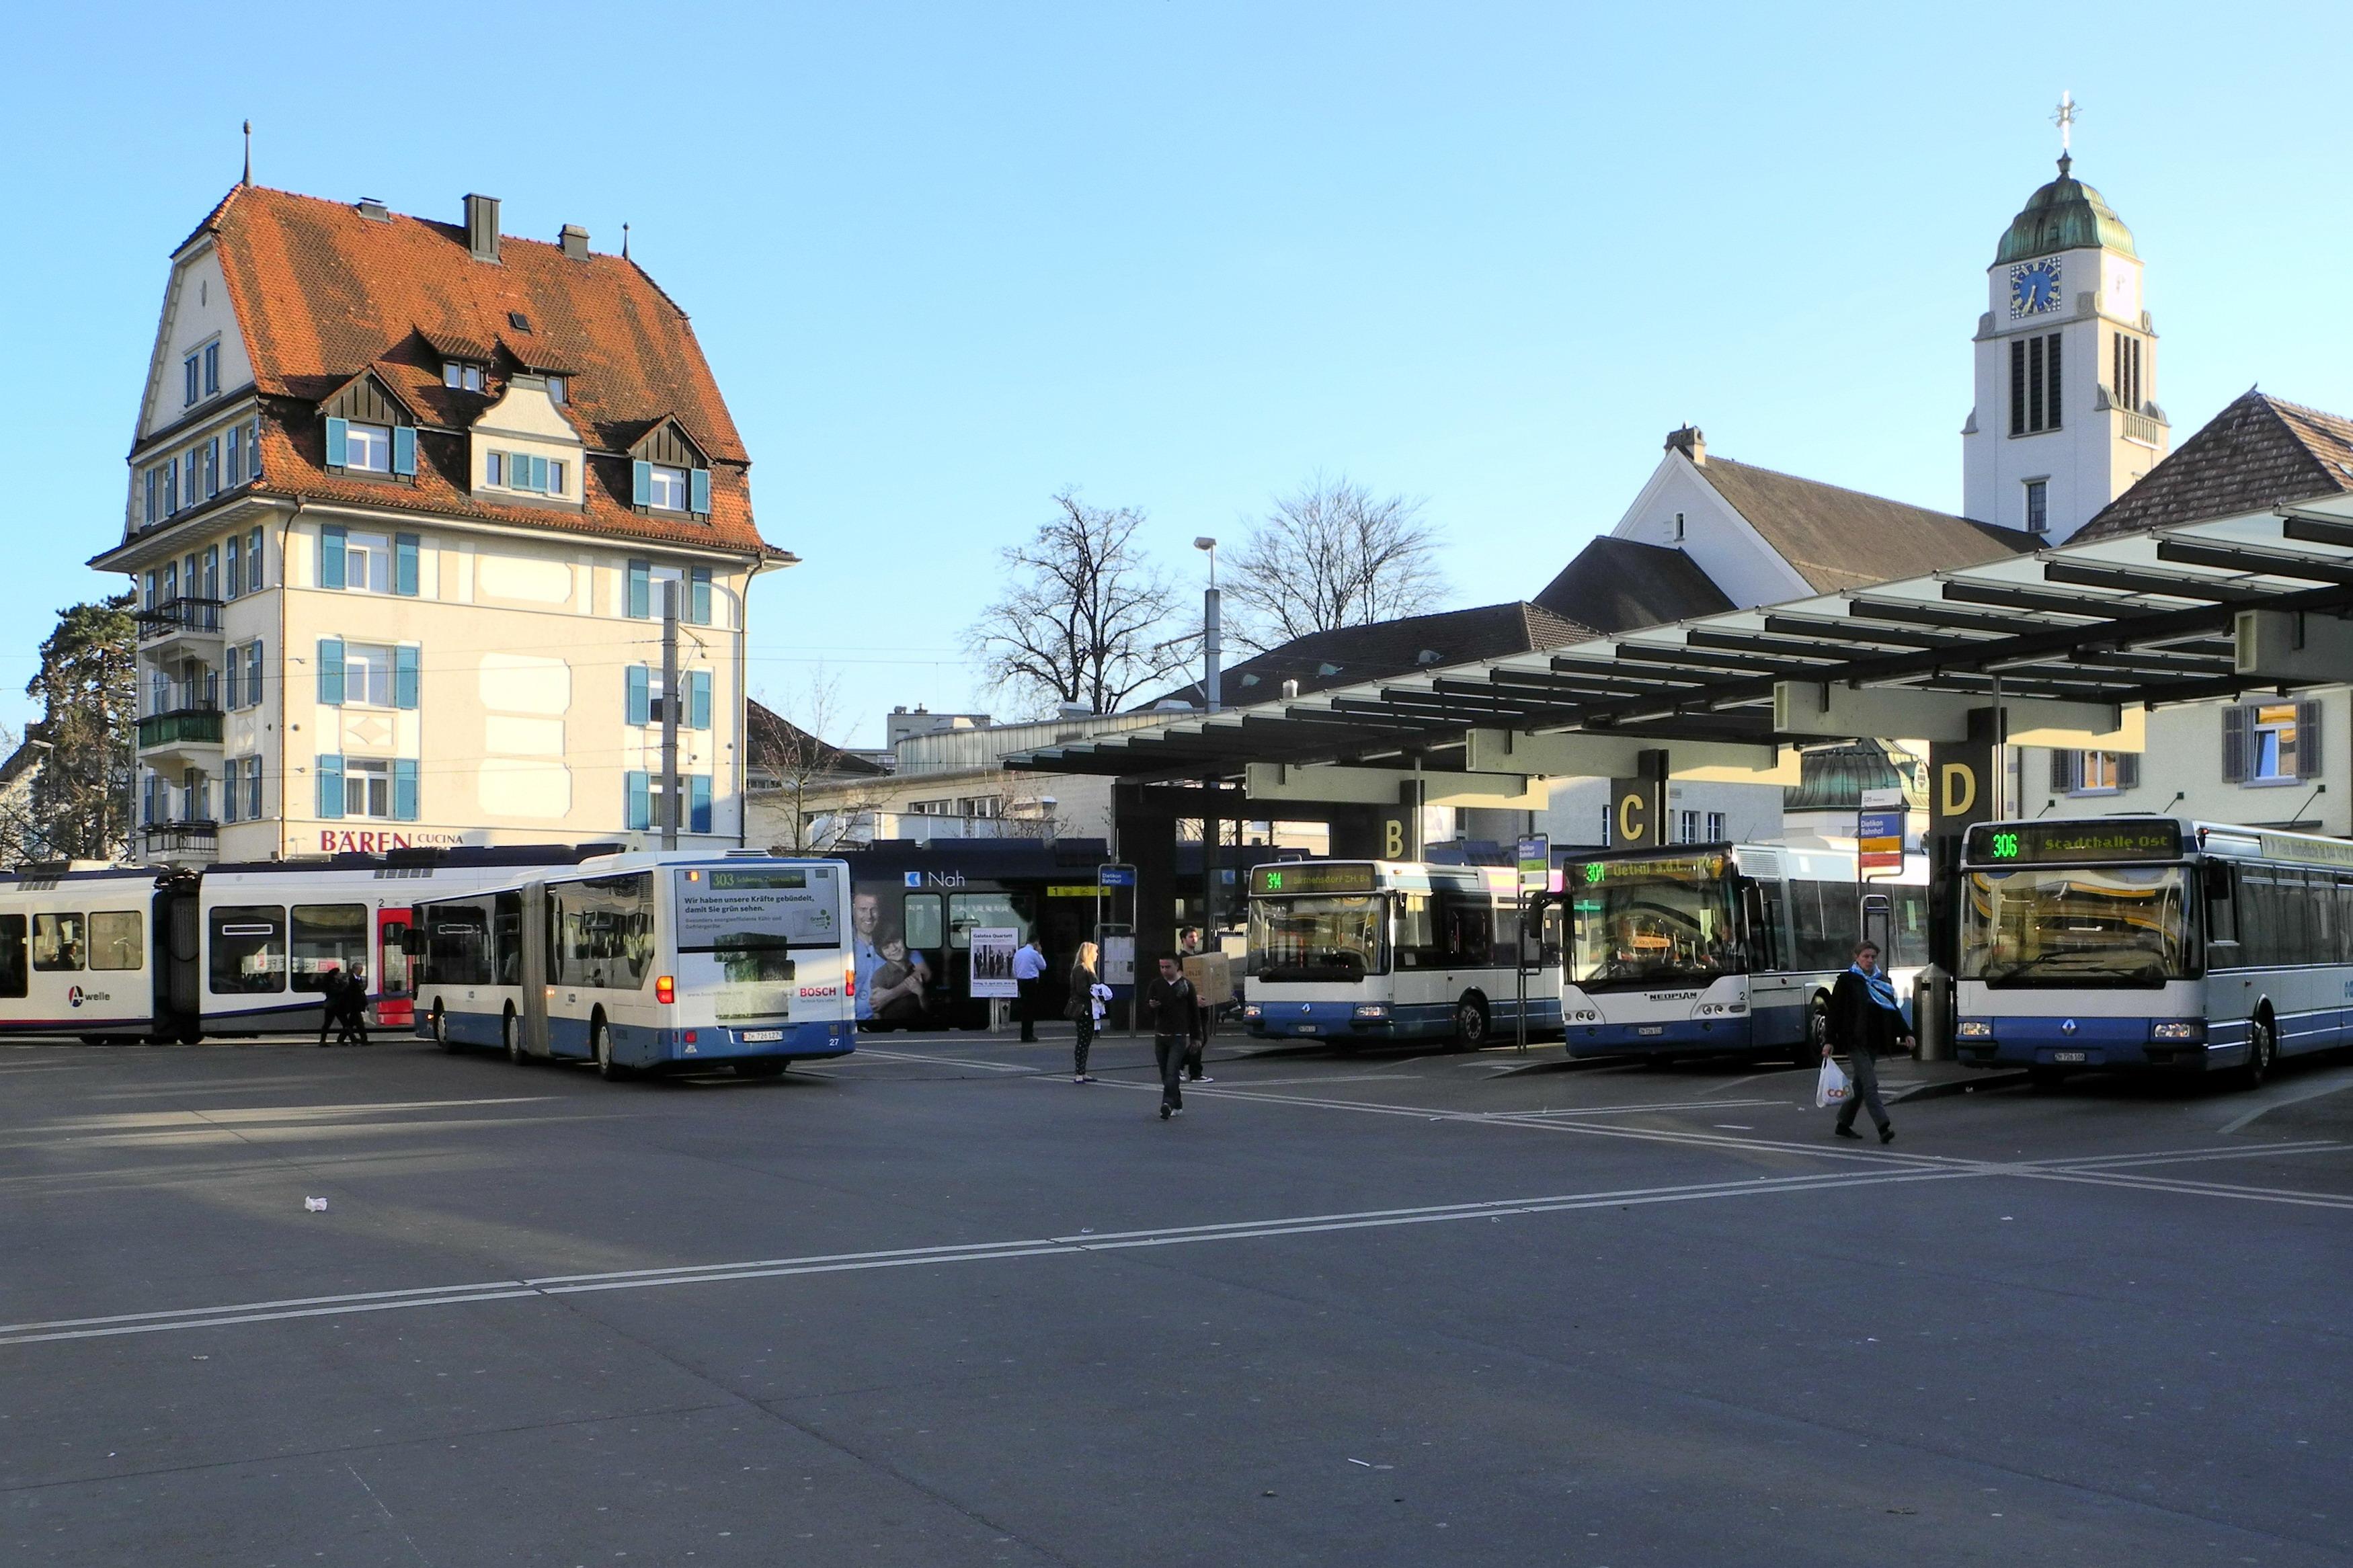 Dietikon Switzerland  city photos gallery : Description Dietikon Bahnhof 2012 03 26 18 33 22 P7000 ShiftN